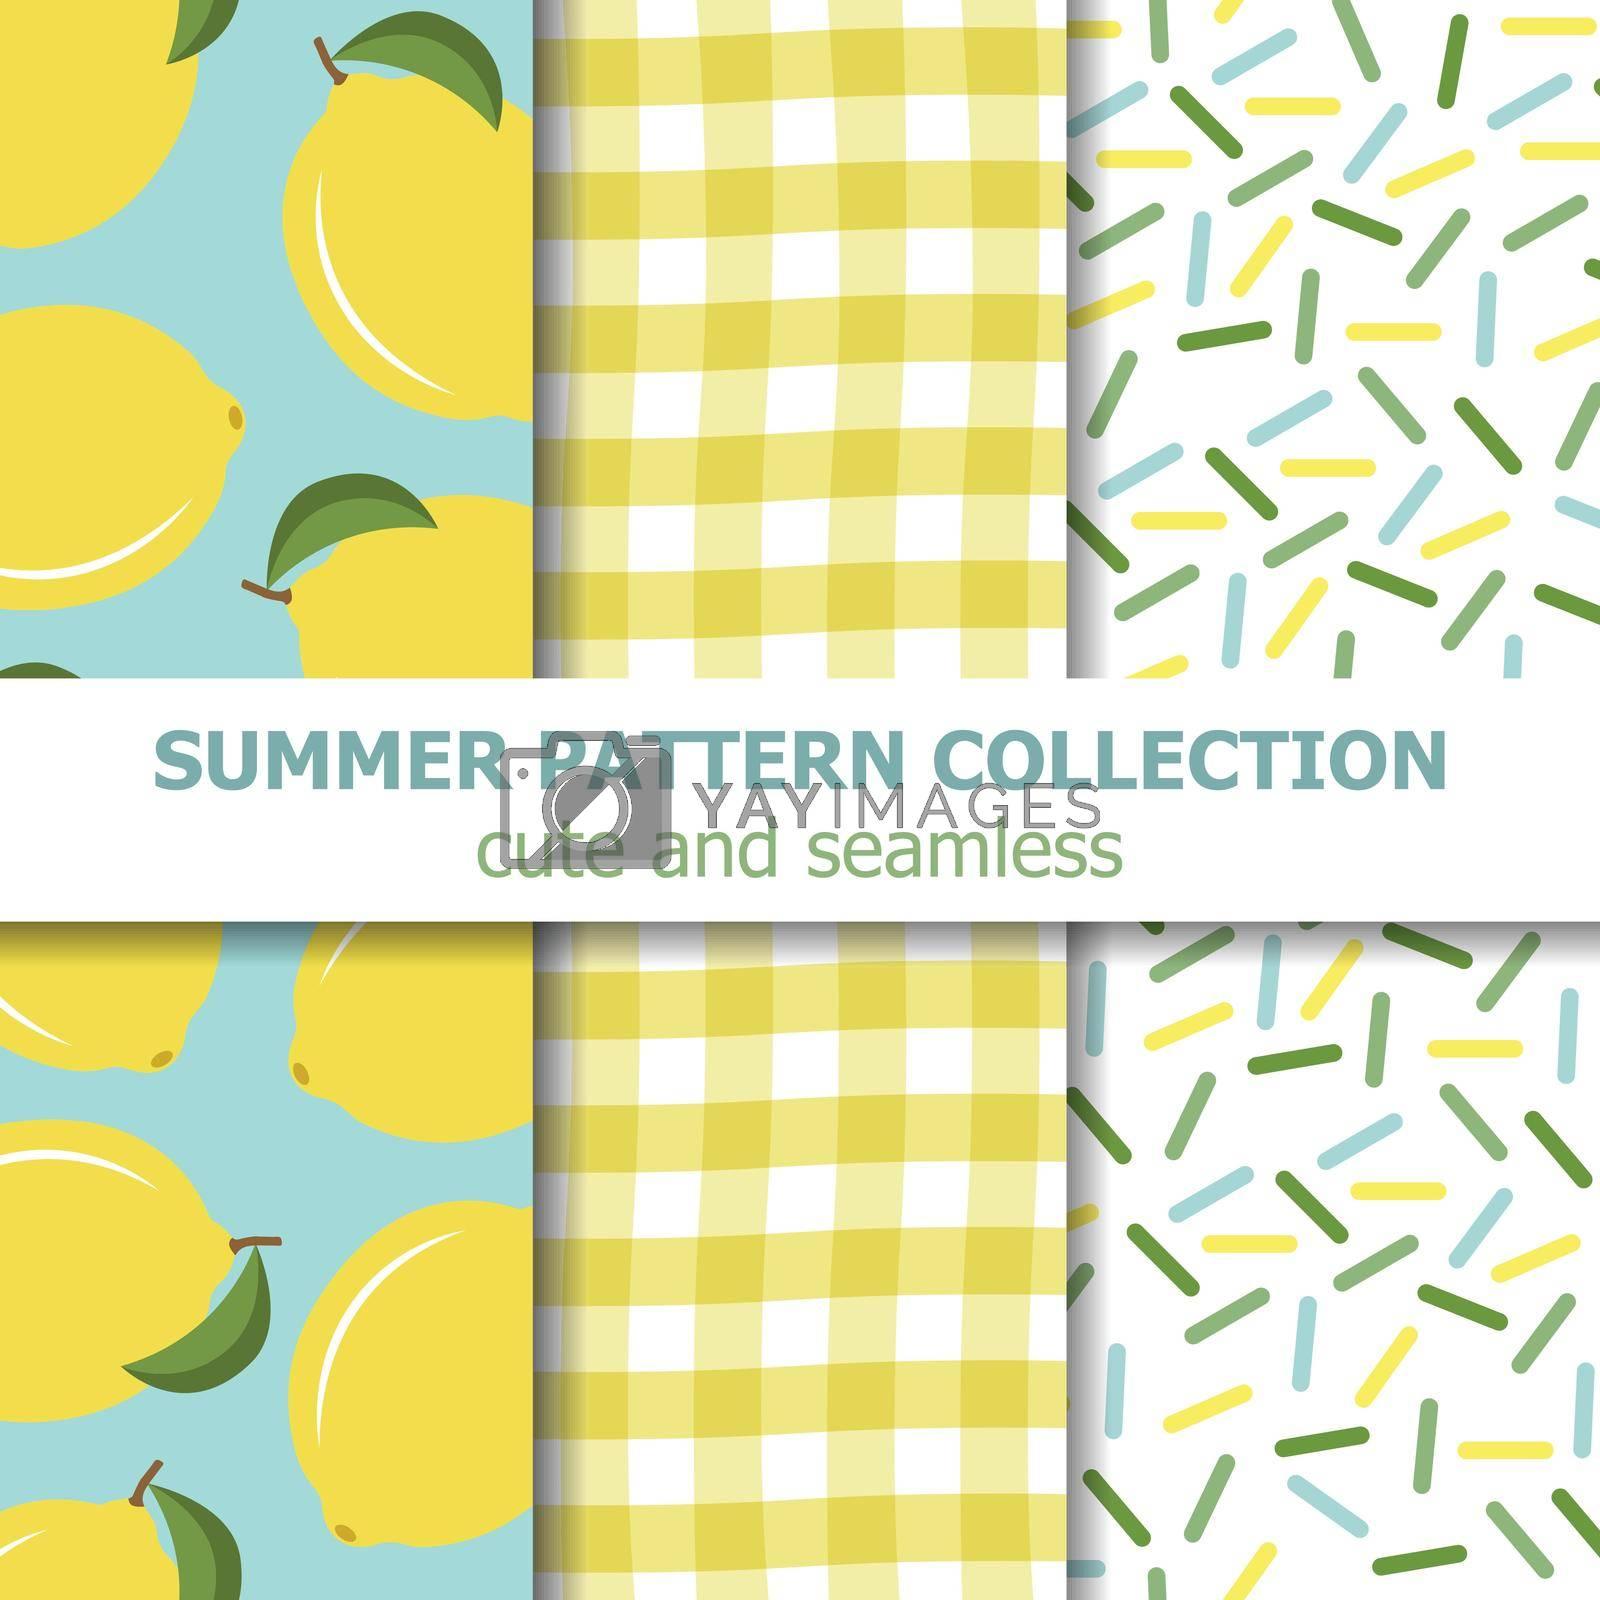 summer pattern collection. Lemon theme. Summer banner. Vector